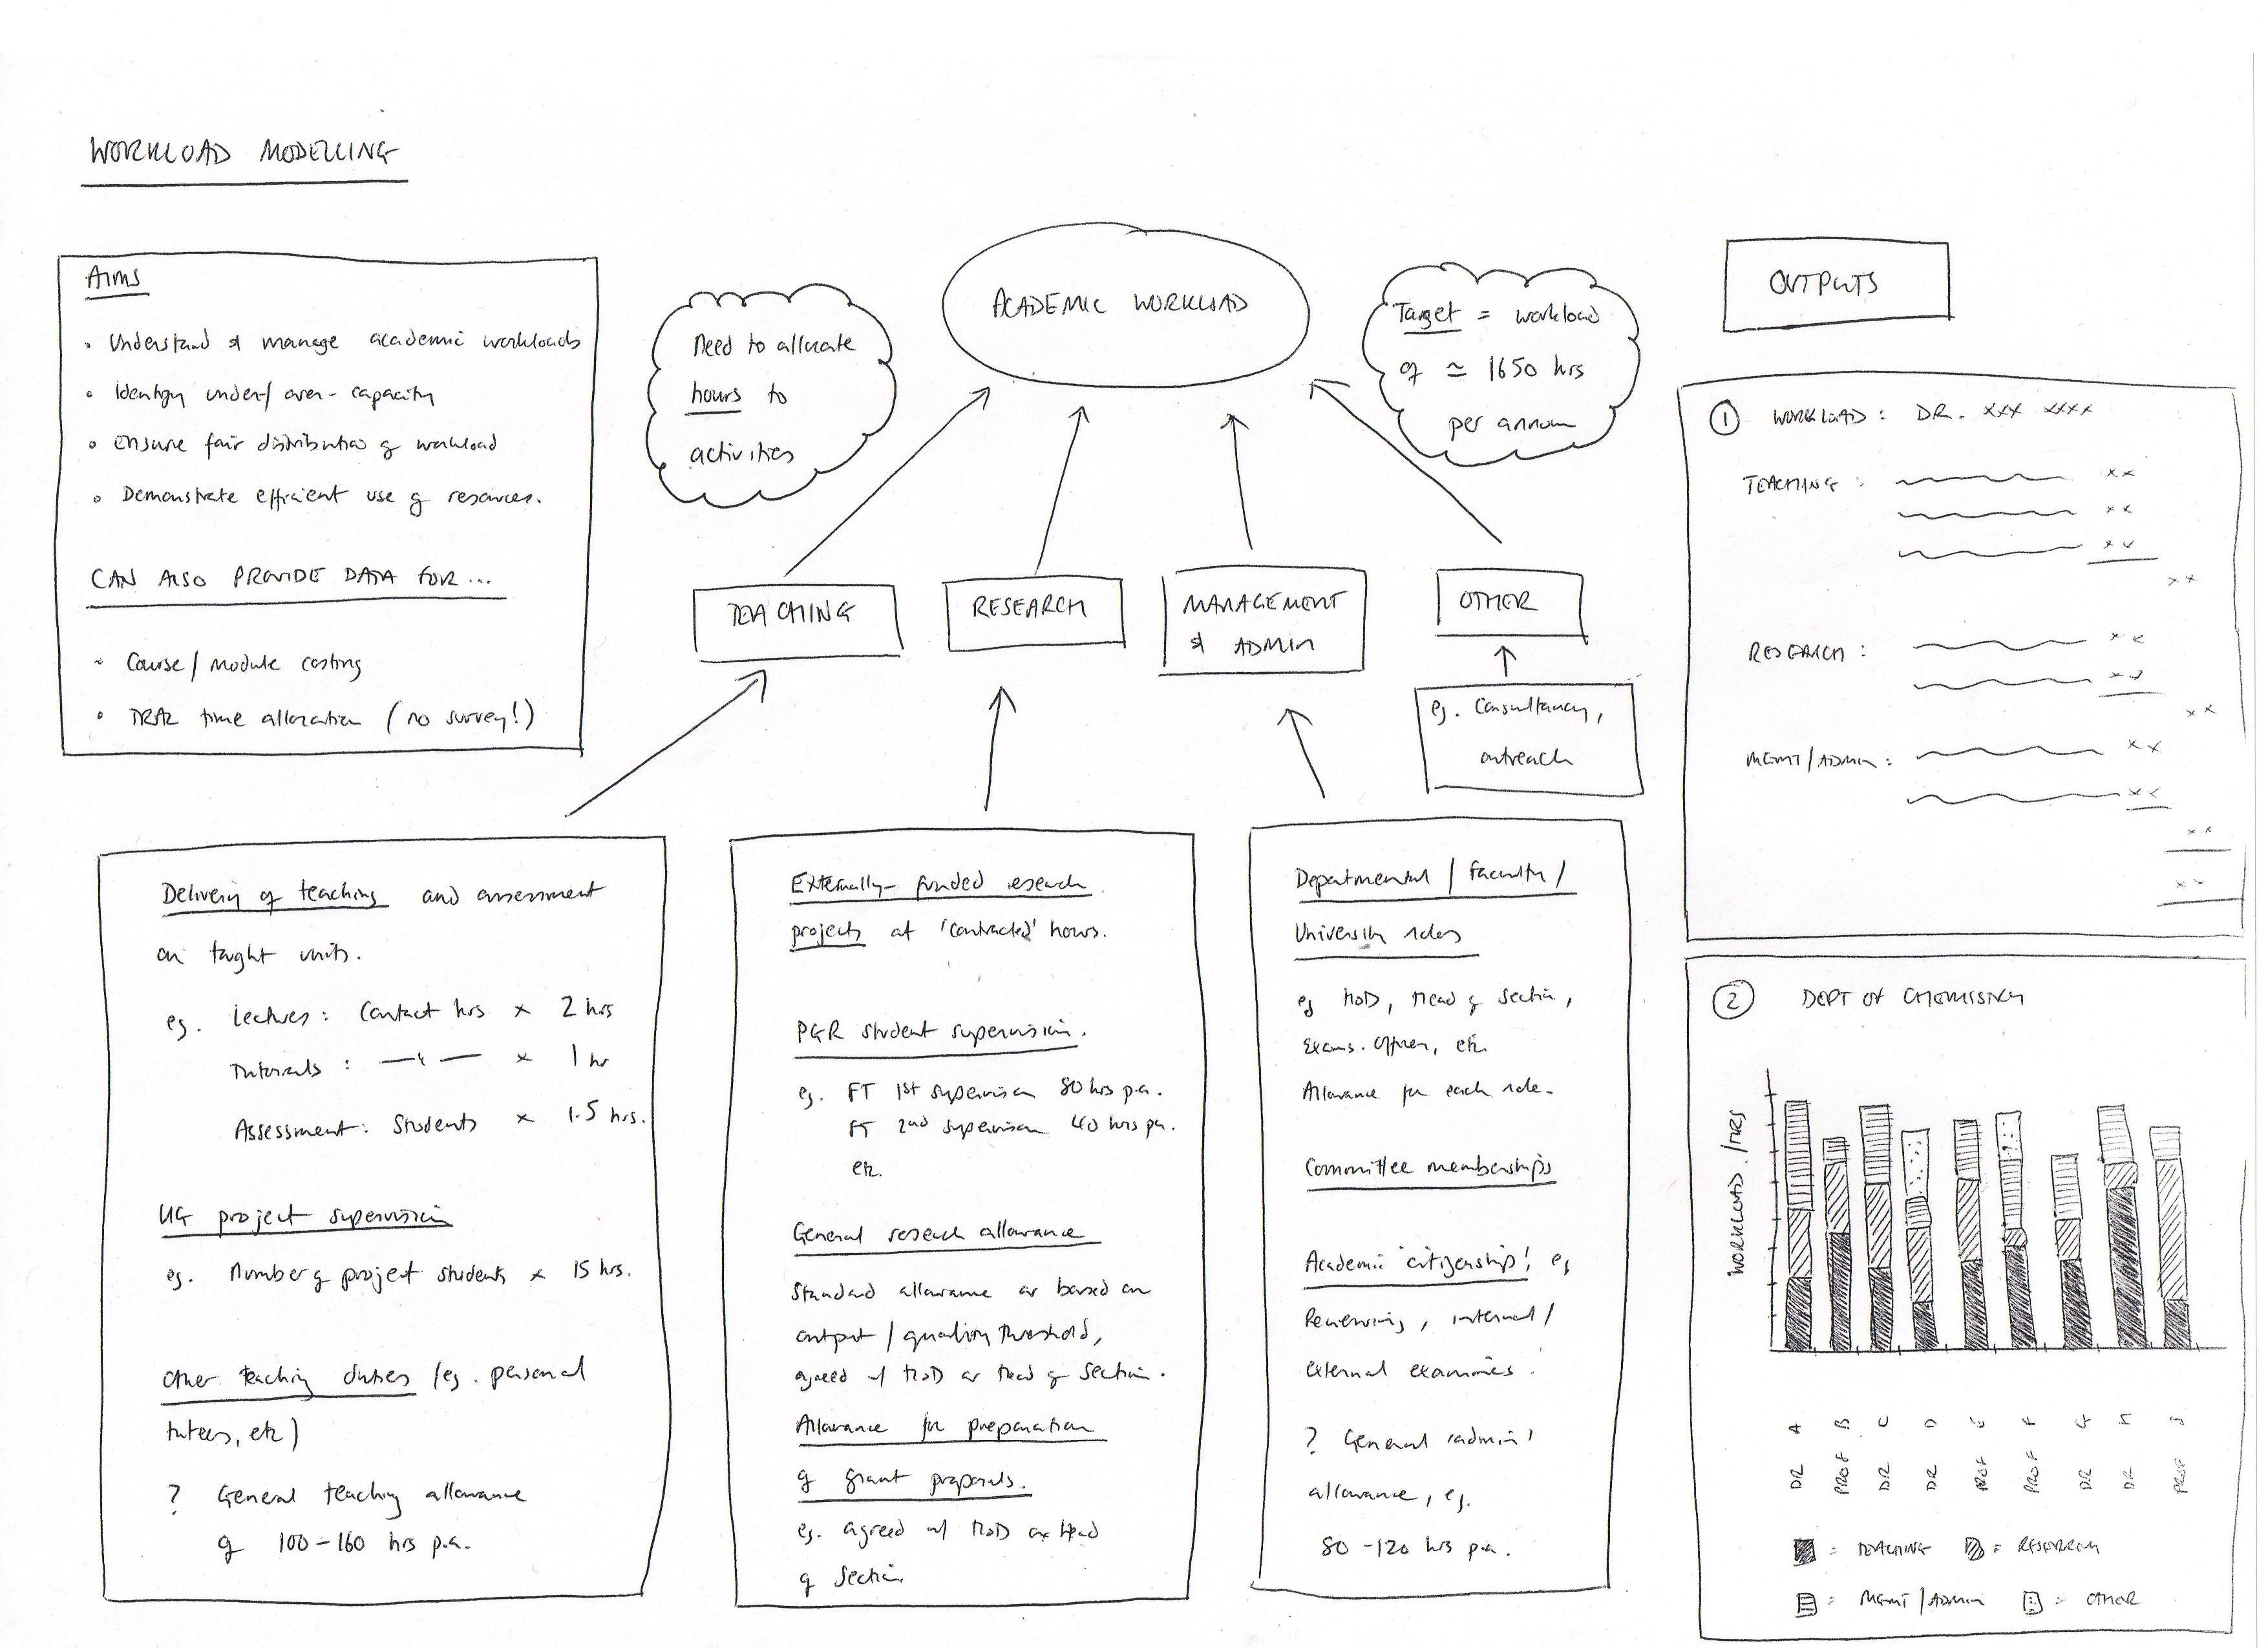 Workload Model